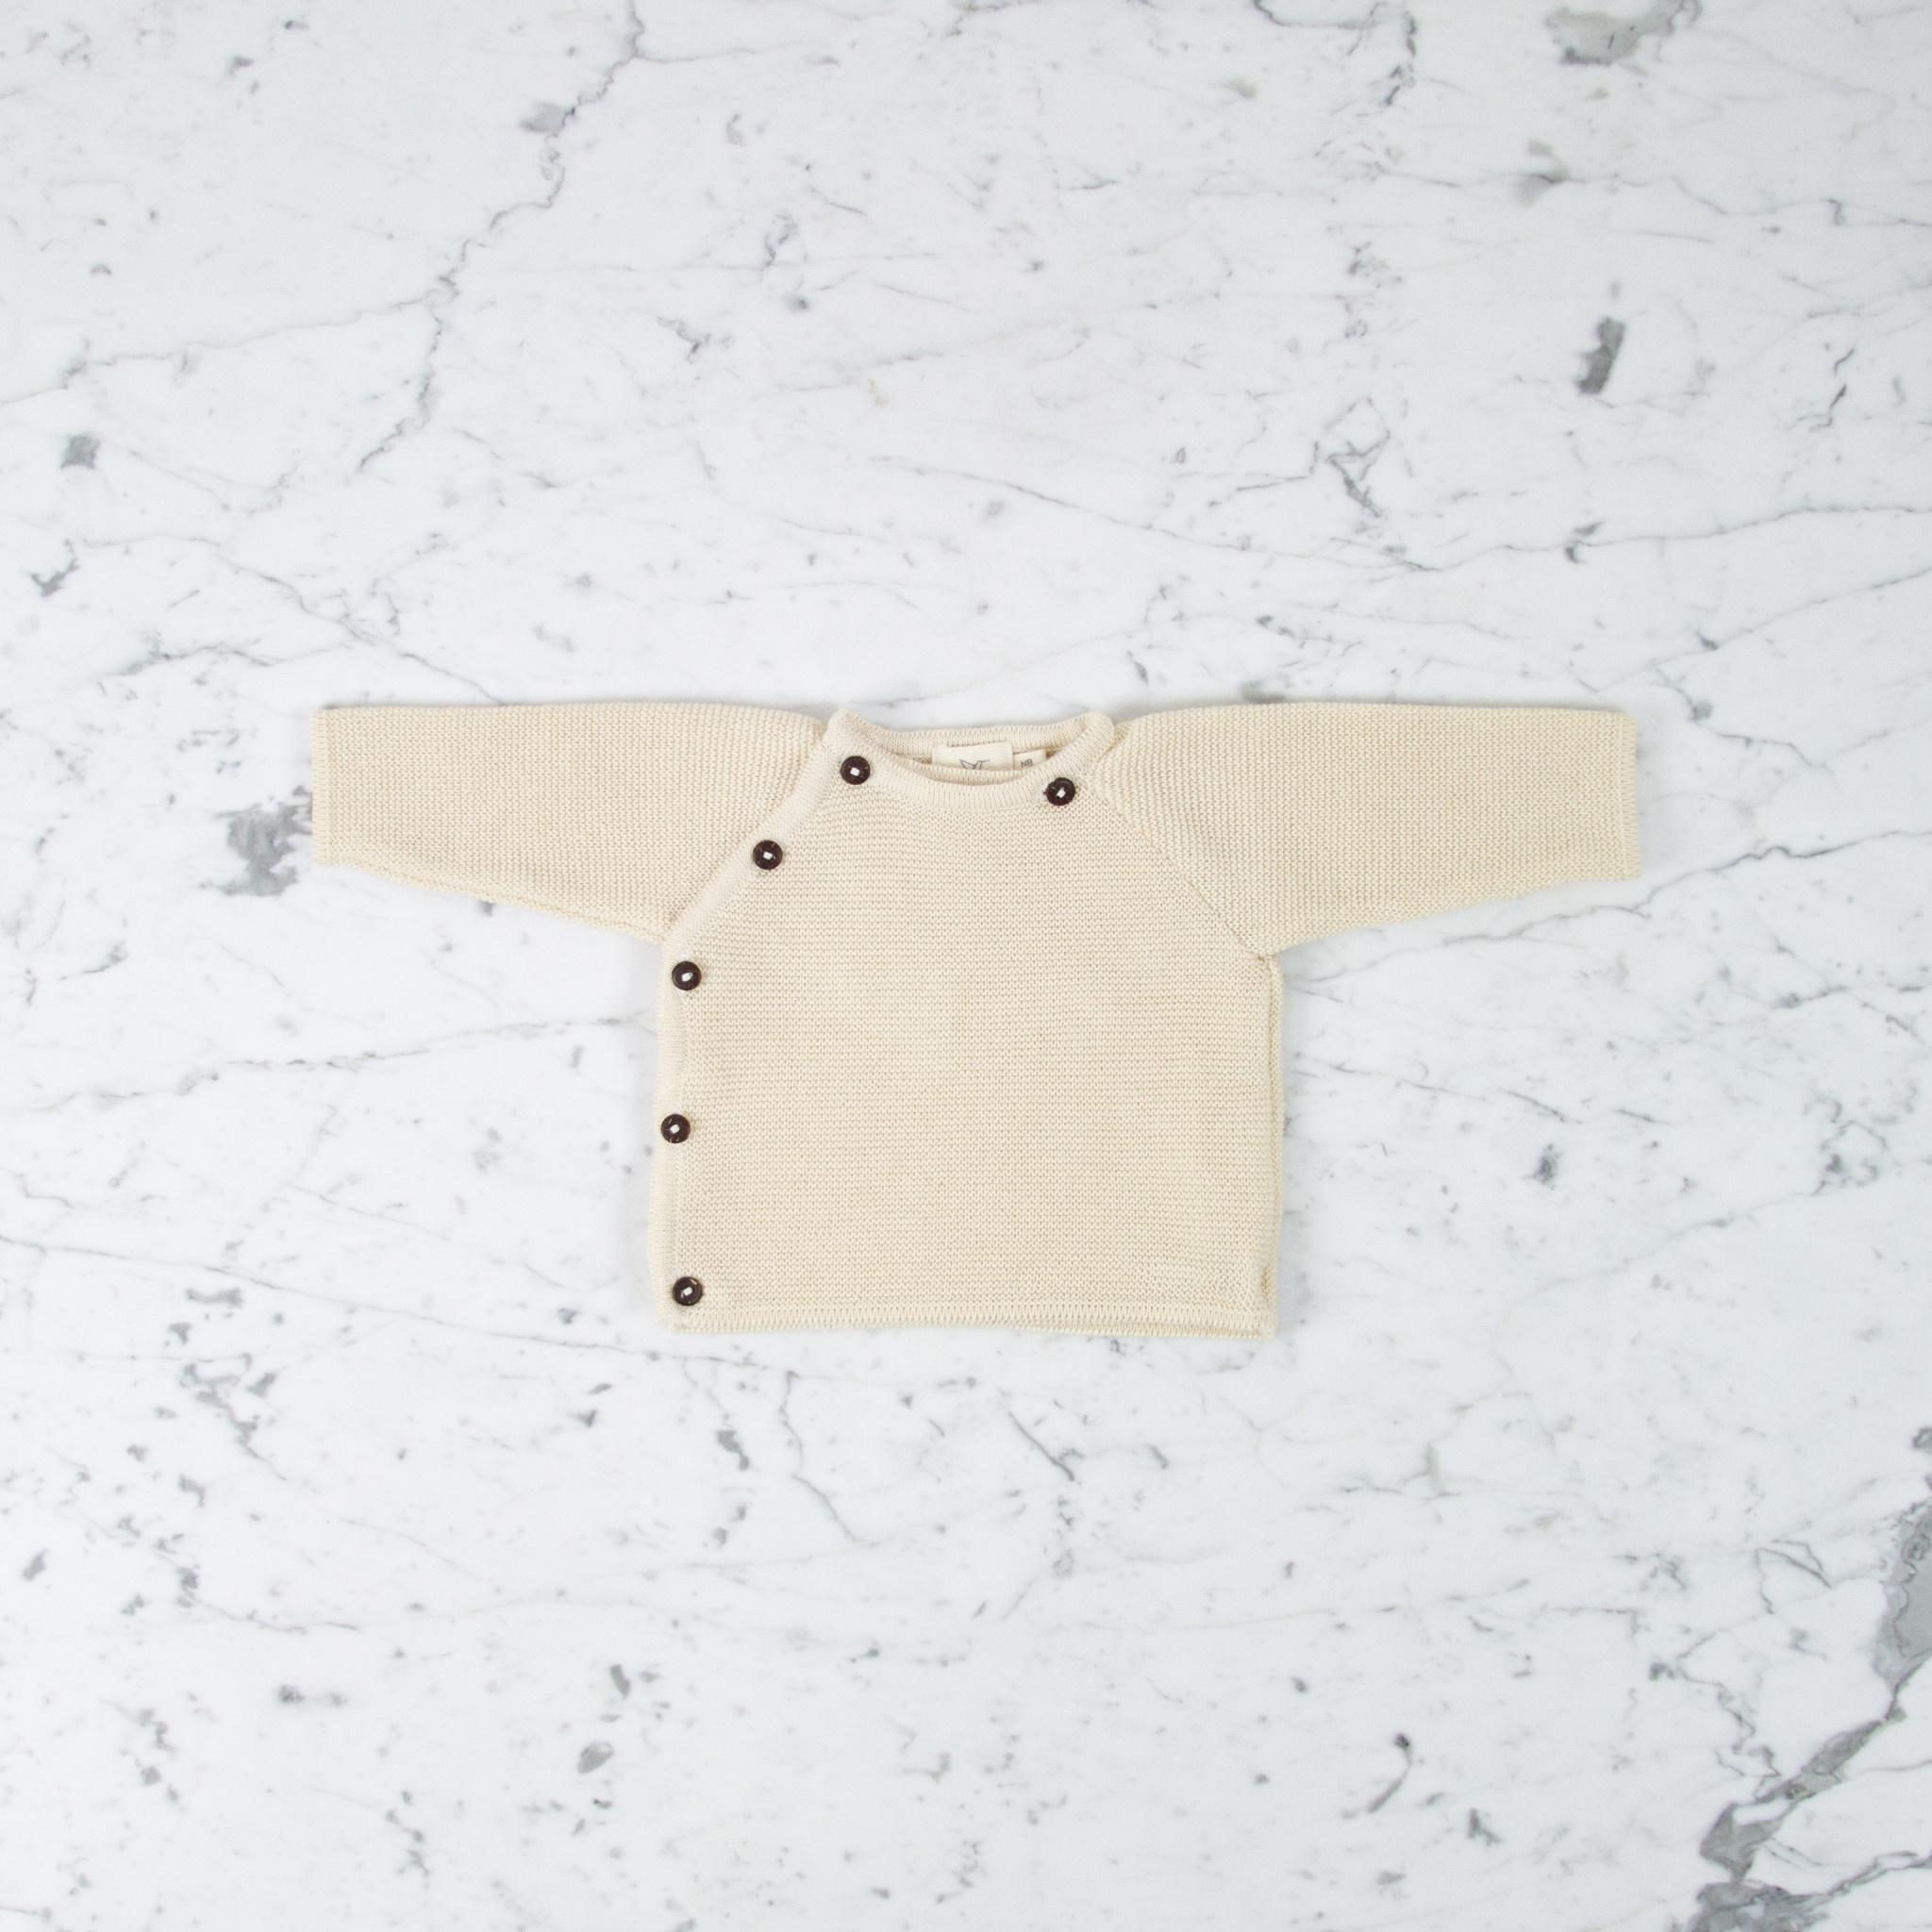 Petit Kolibri Alpaca + Cotton Knit Jacket Sweater - Beige Cream - 0-3 Month